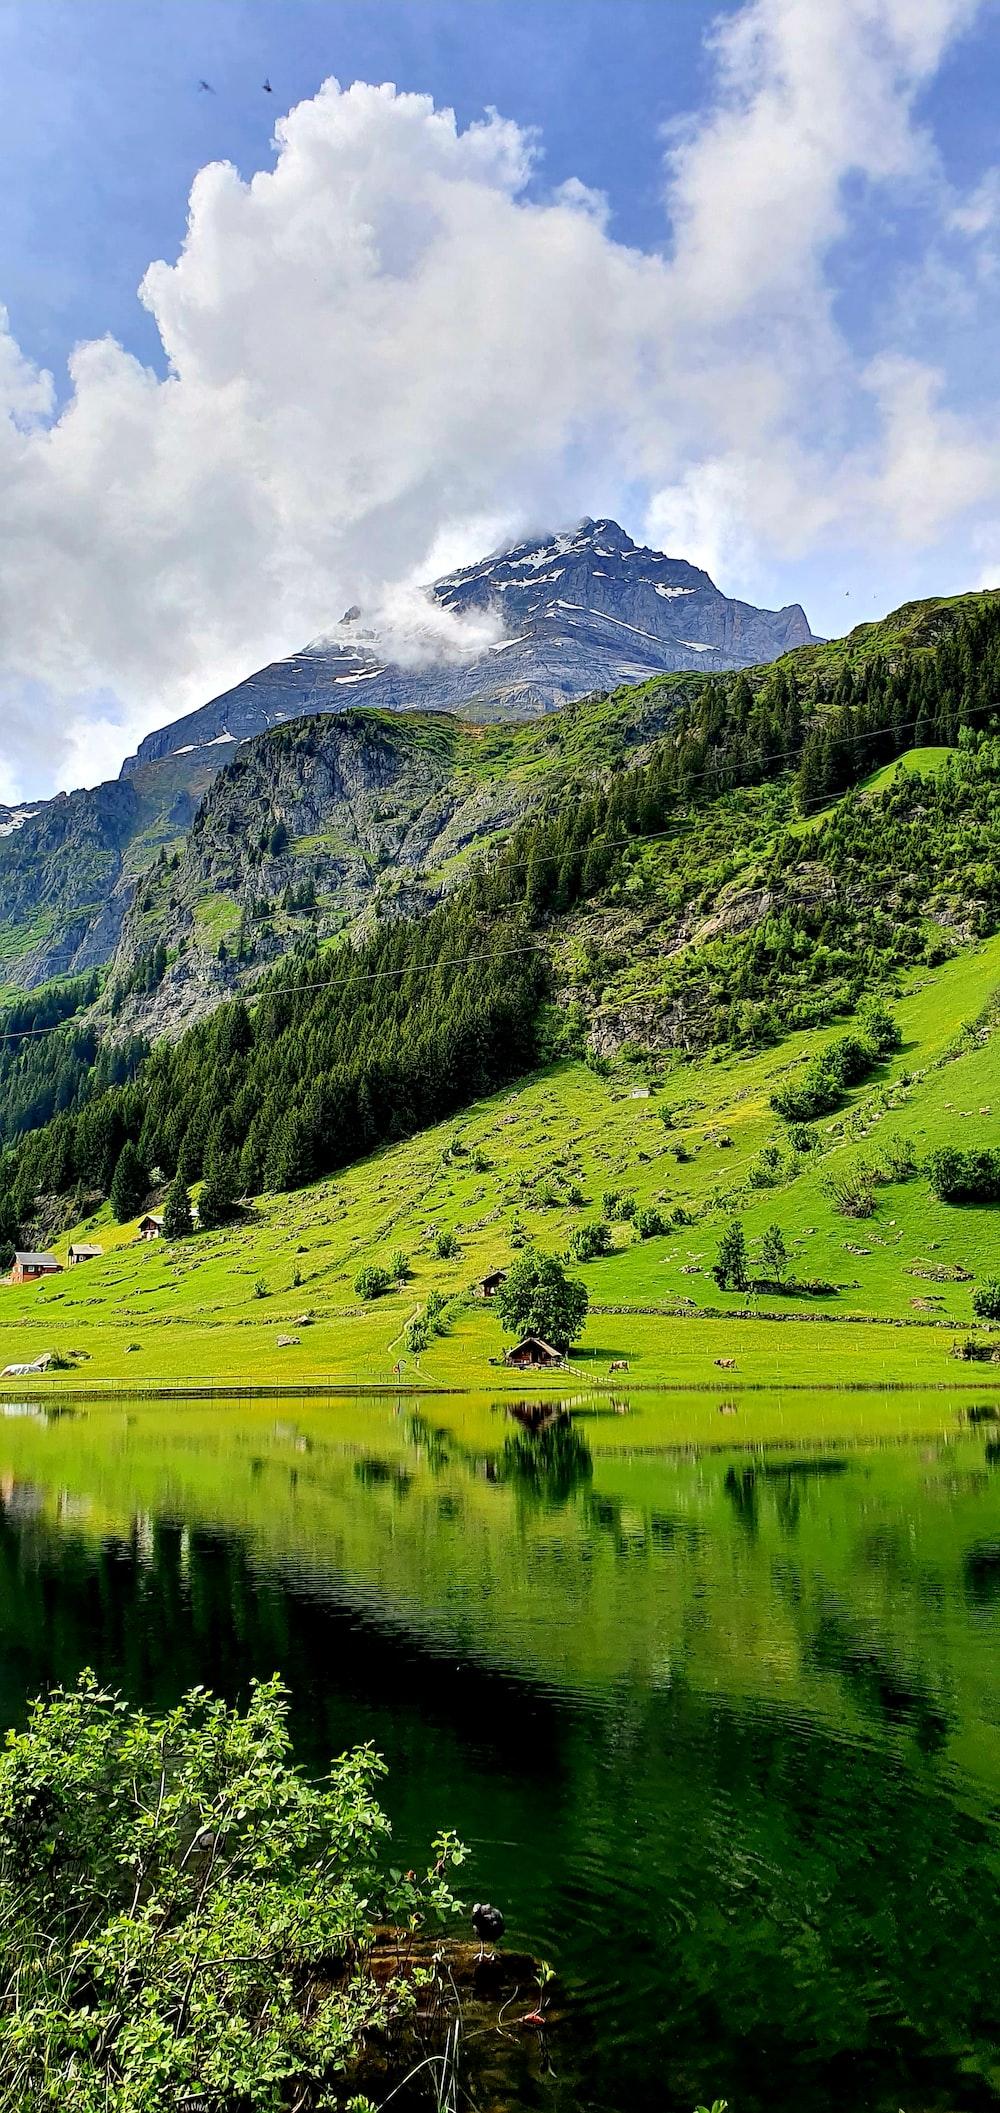 green grass field near lake and mountain